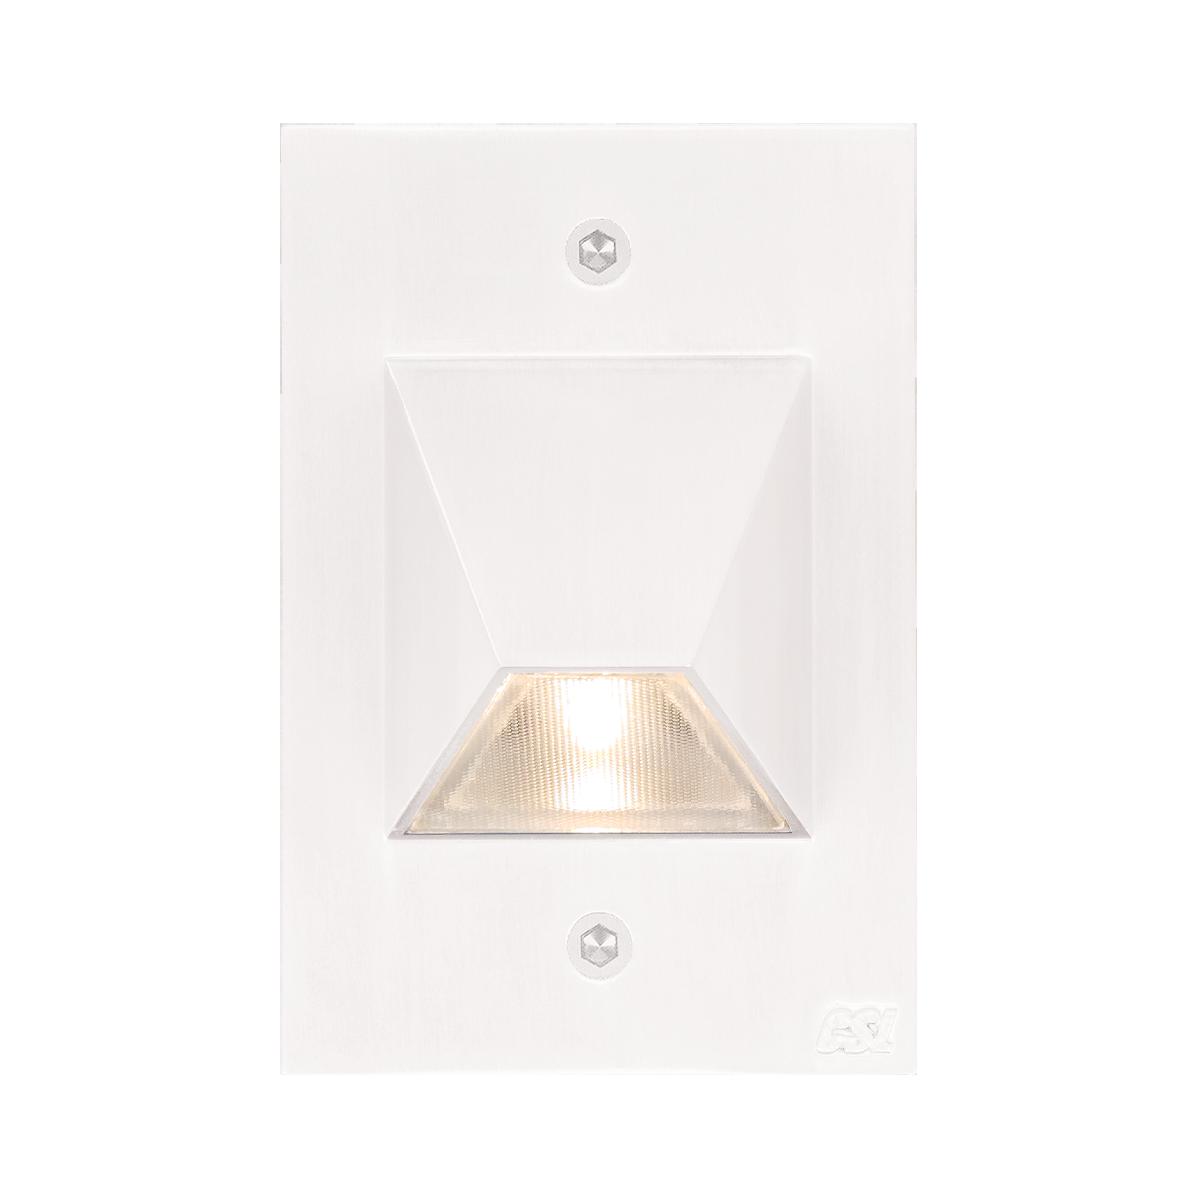 "4-1 - 2"" x 3"" LED Step Light, White Finish"